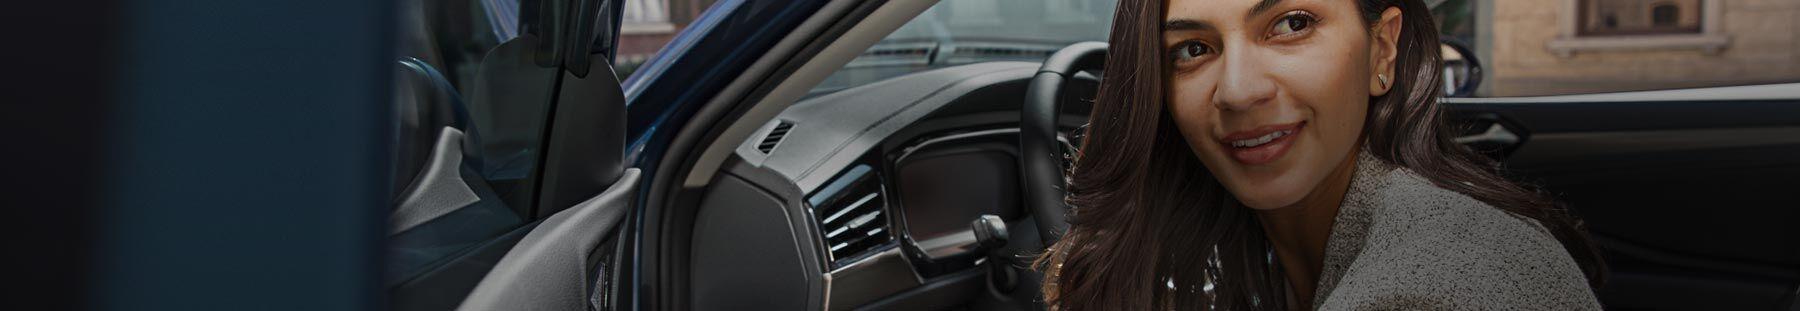 All New Volkswagen Jetta in Folsom, CA